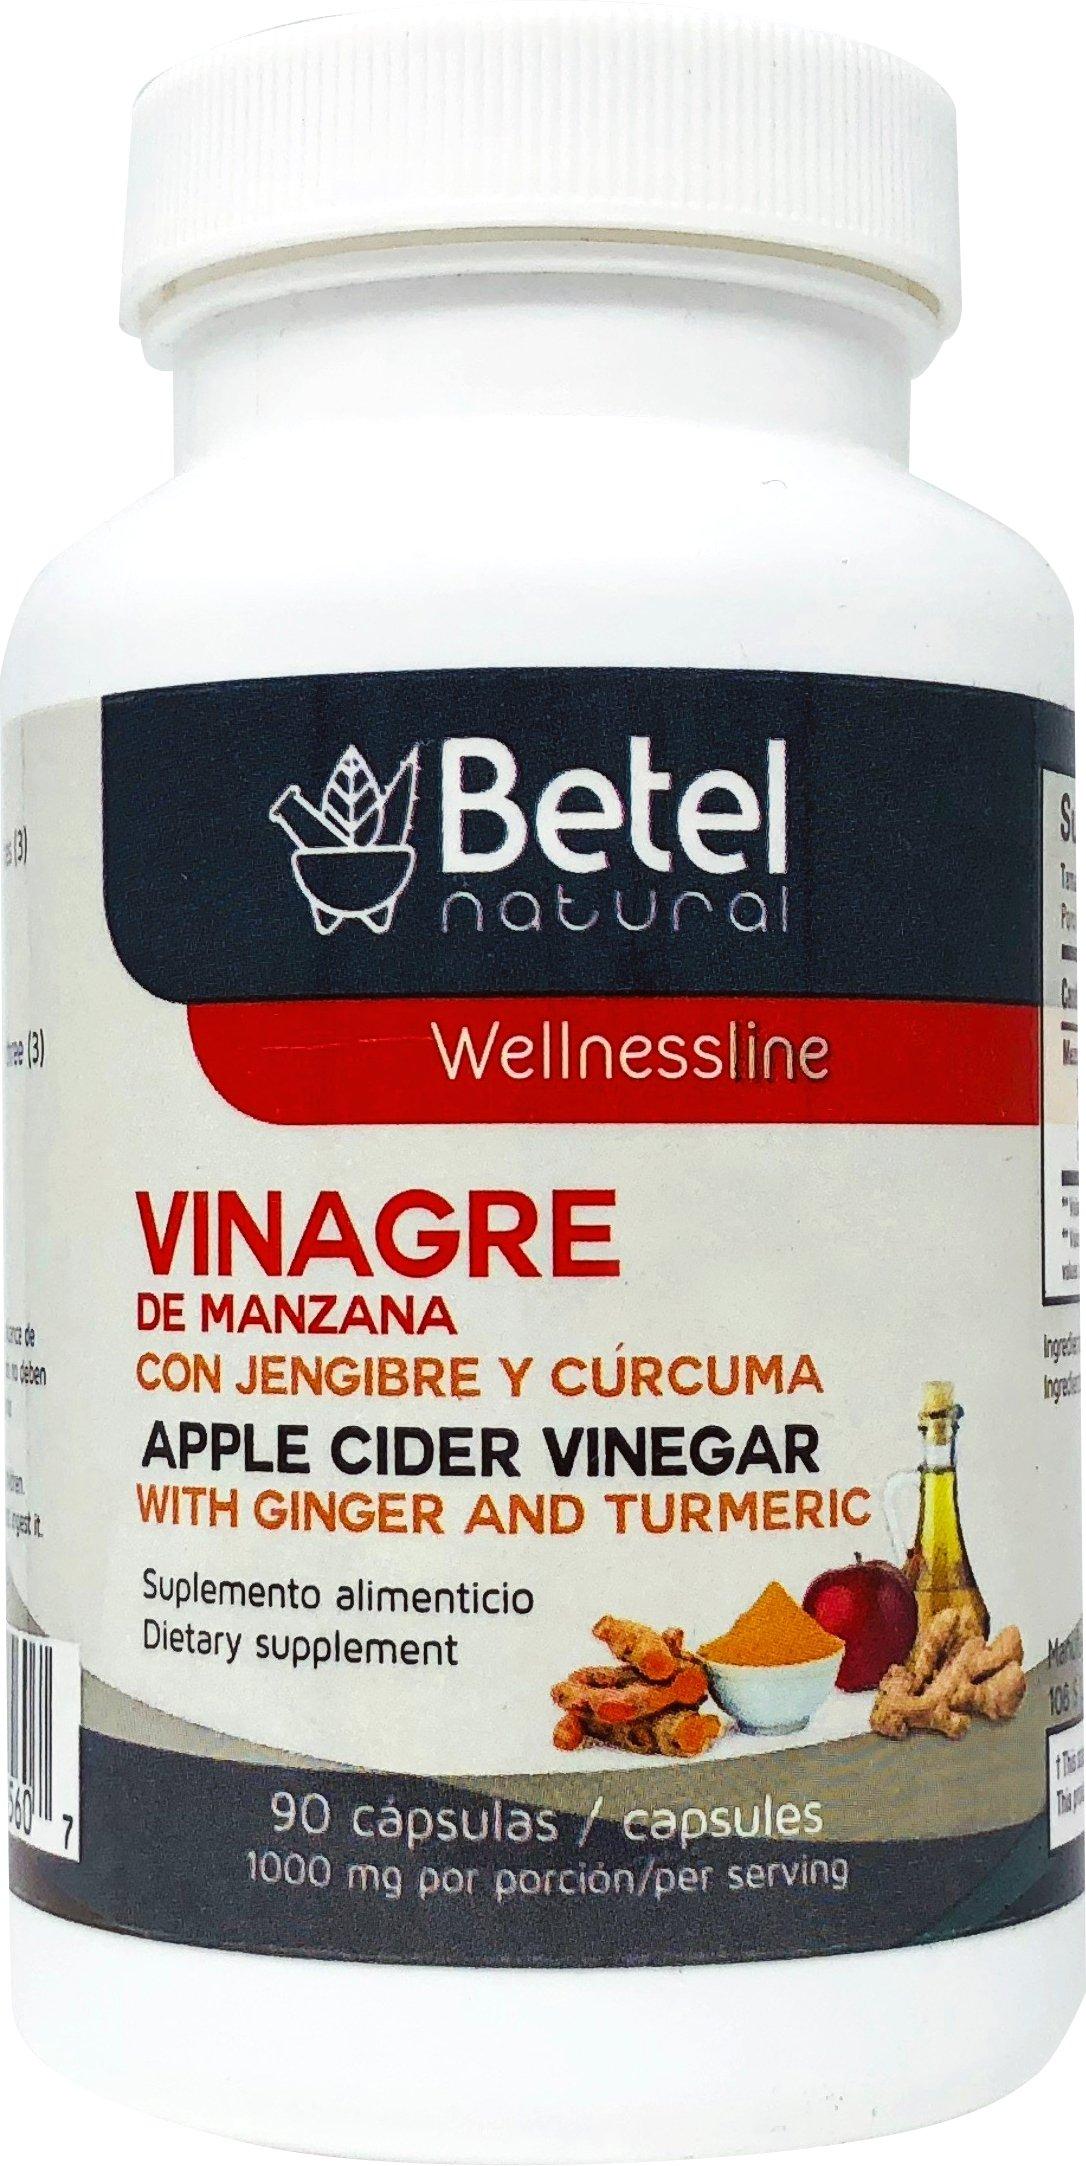 Vinagre de Manzana con Jengibre y Curcuma - Apple Cider Vinegar with Ginger and Turmeric by Betel Natural - 90 Caps